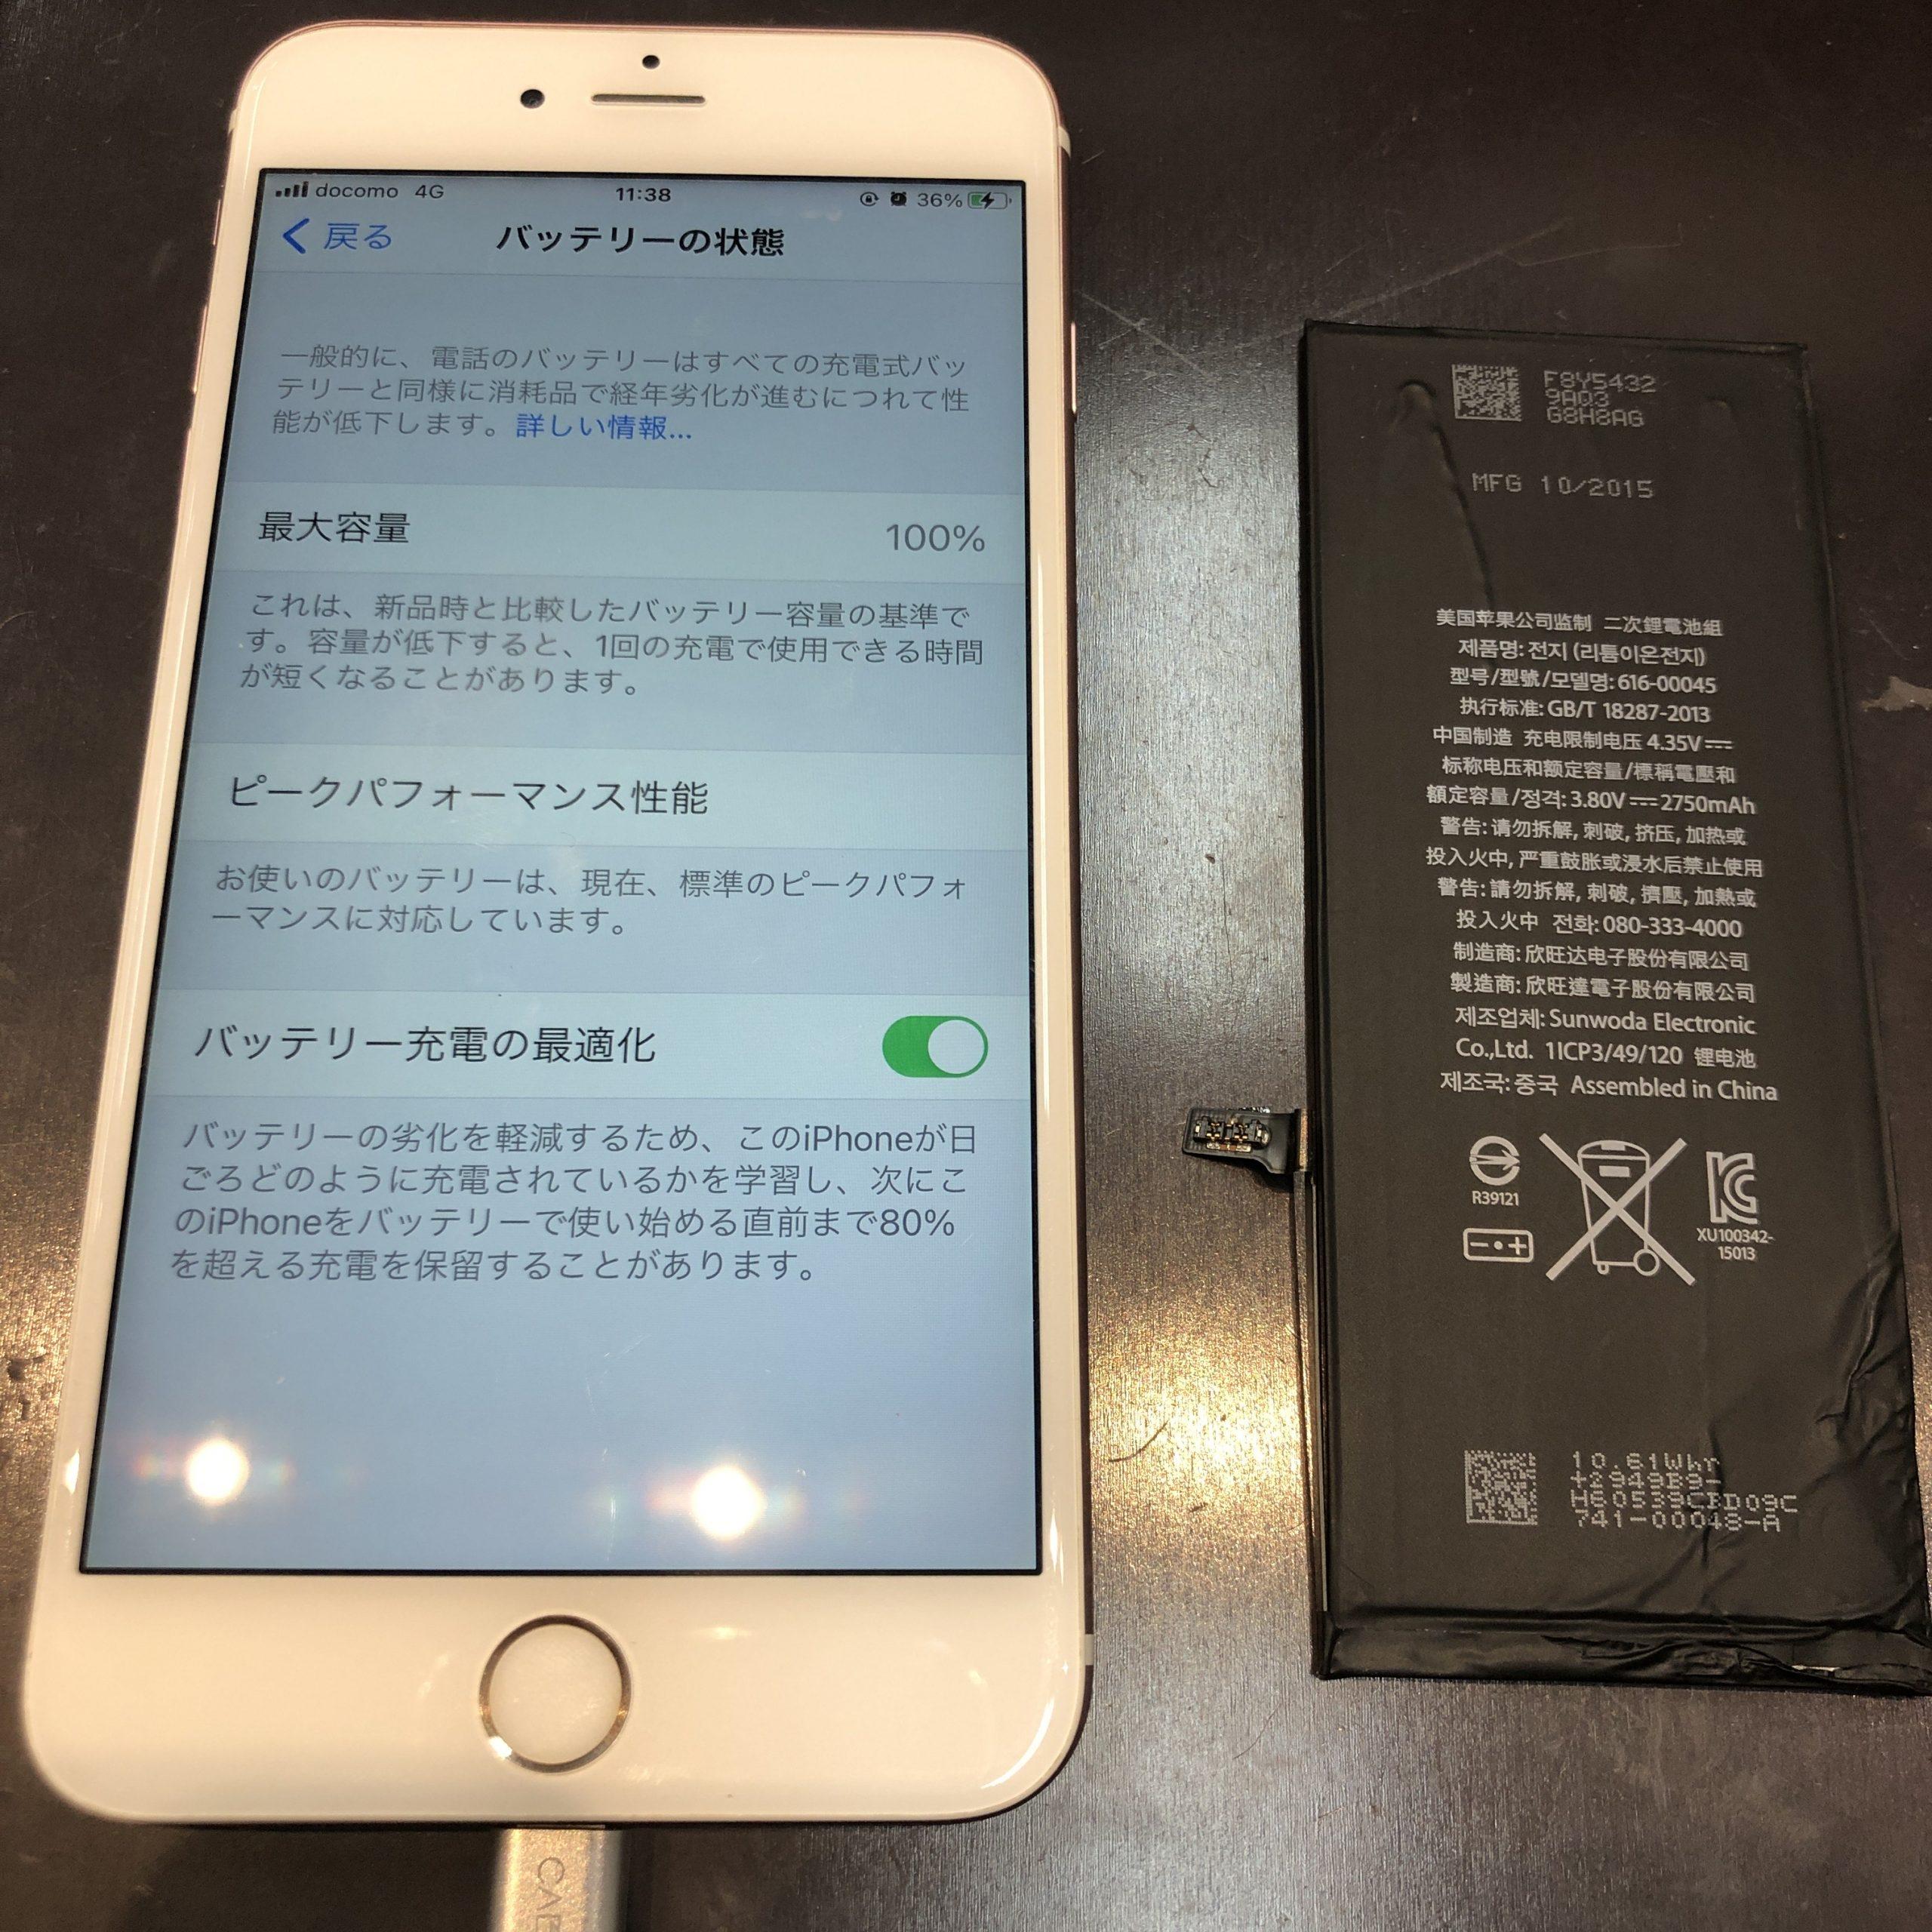 【 iPhone 6s+ 】鹿島市よりバッテリー交換にお越し頂きました✨